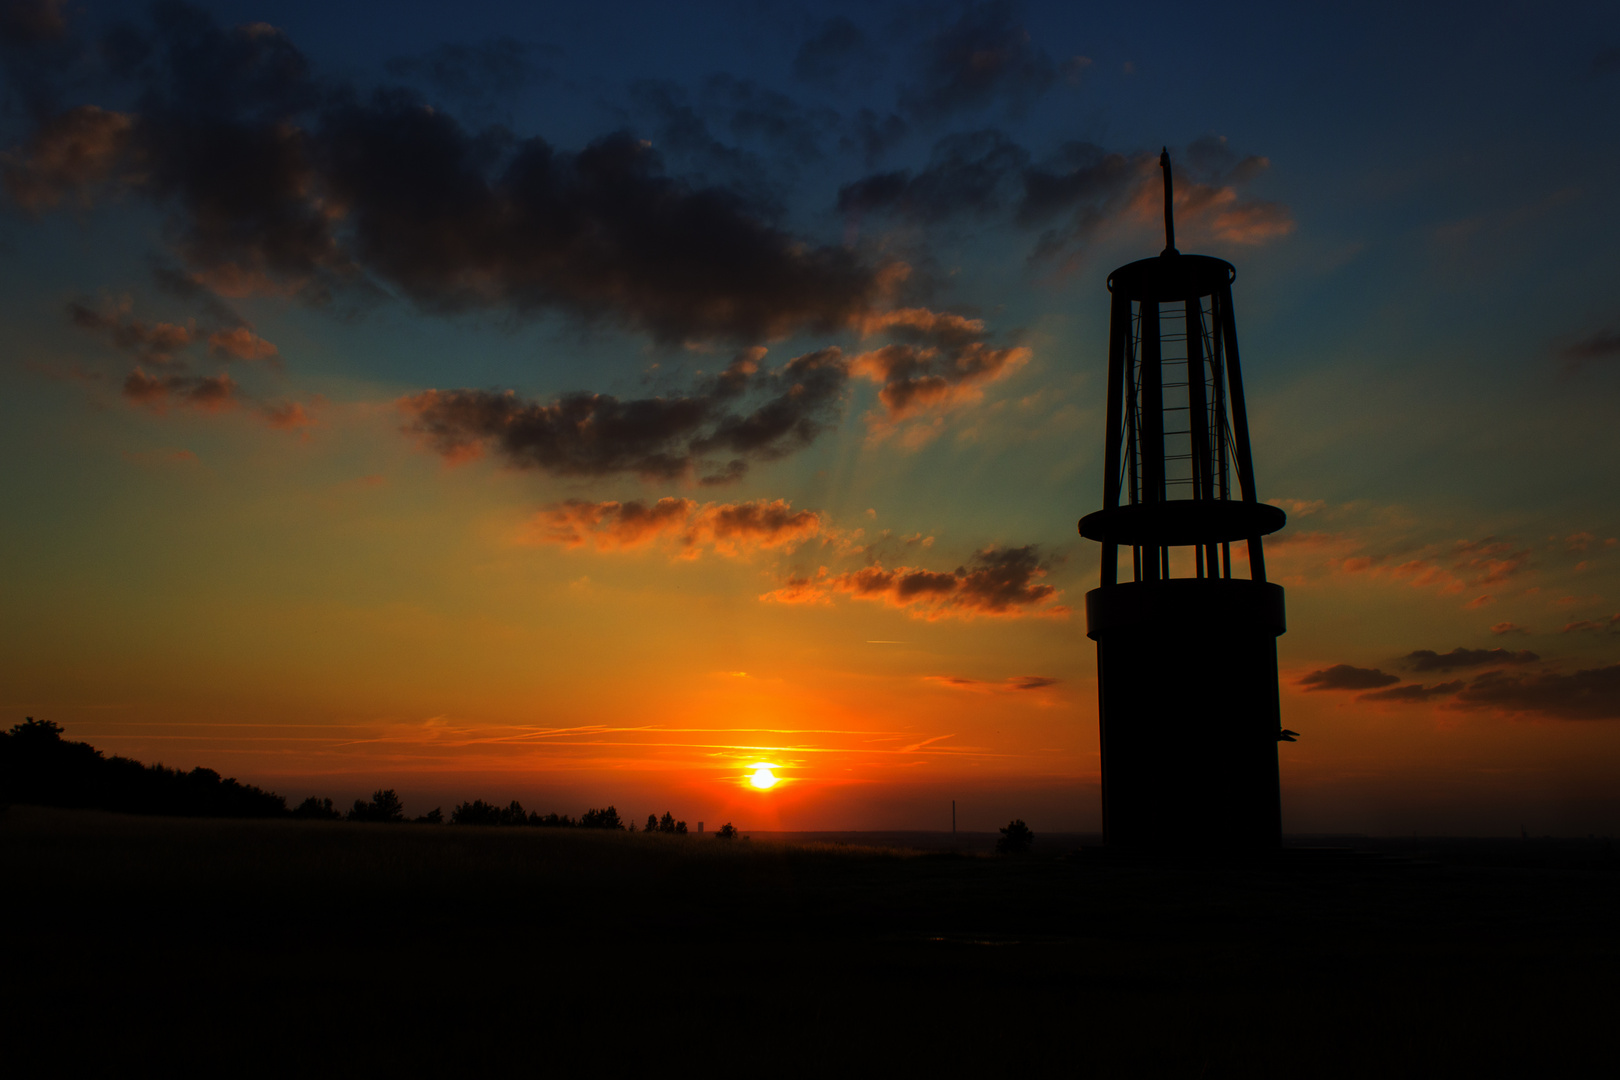 Grubenlampe bei Sonnenuntergang